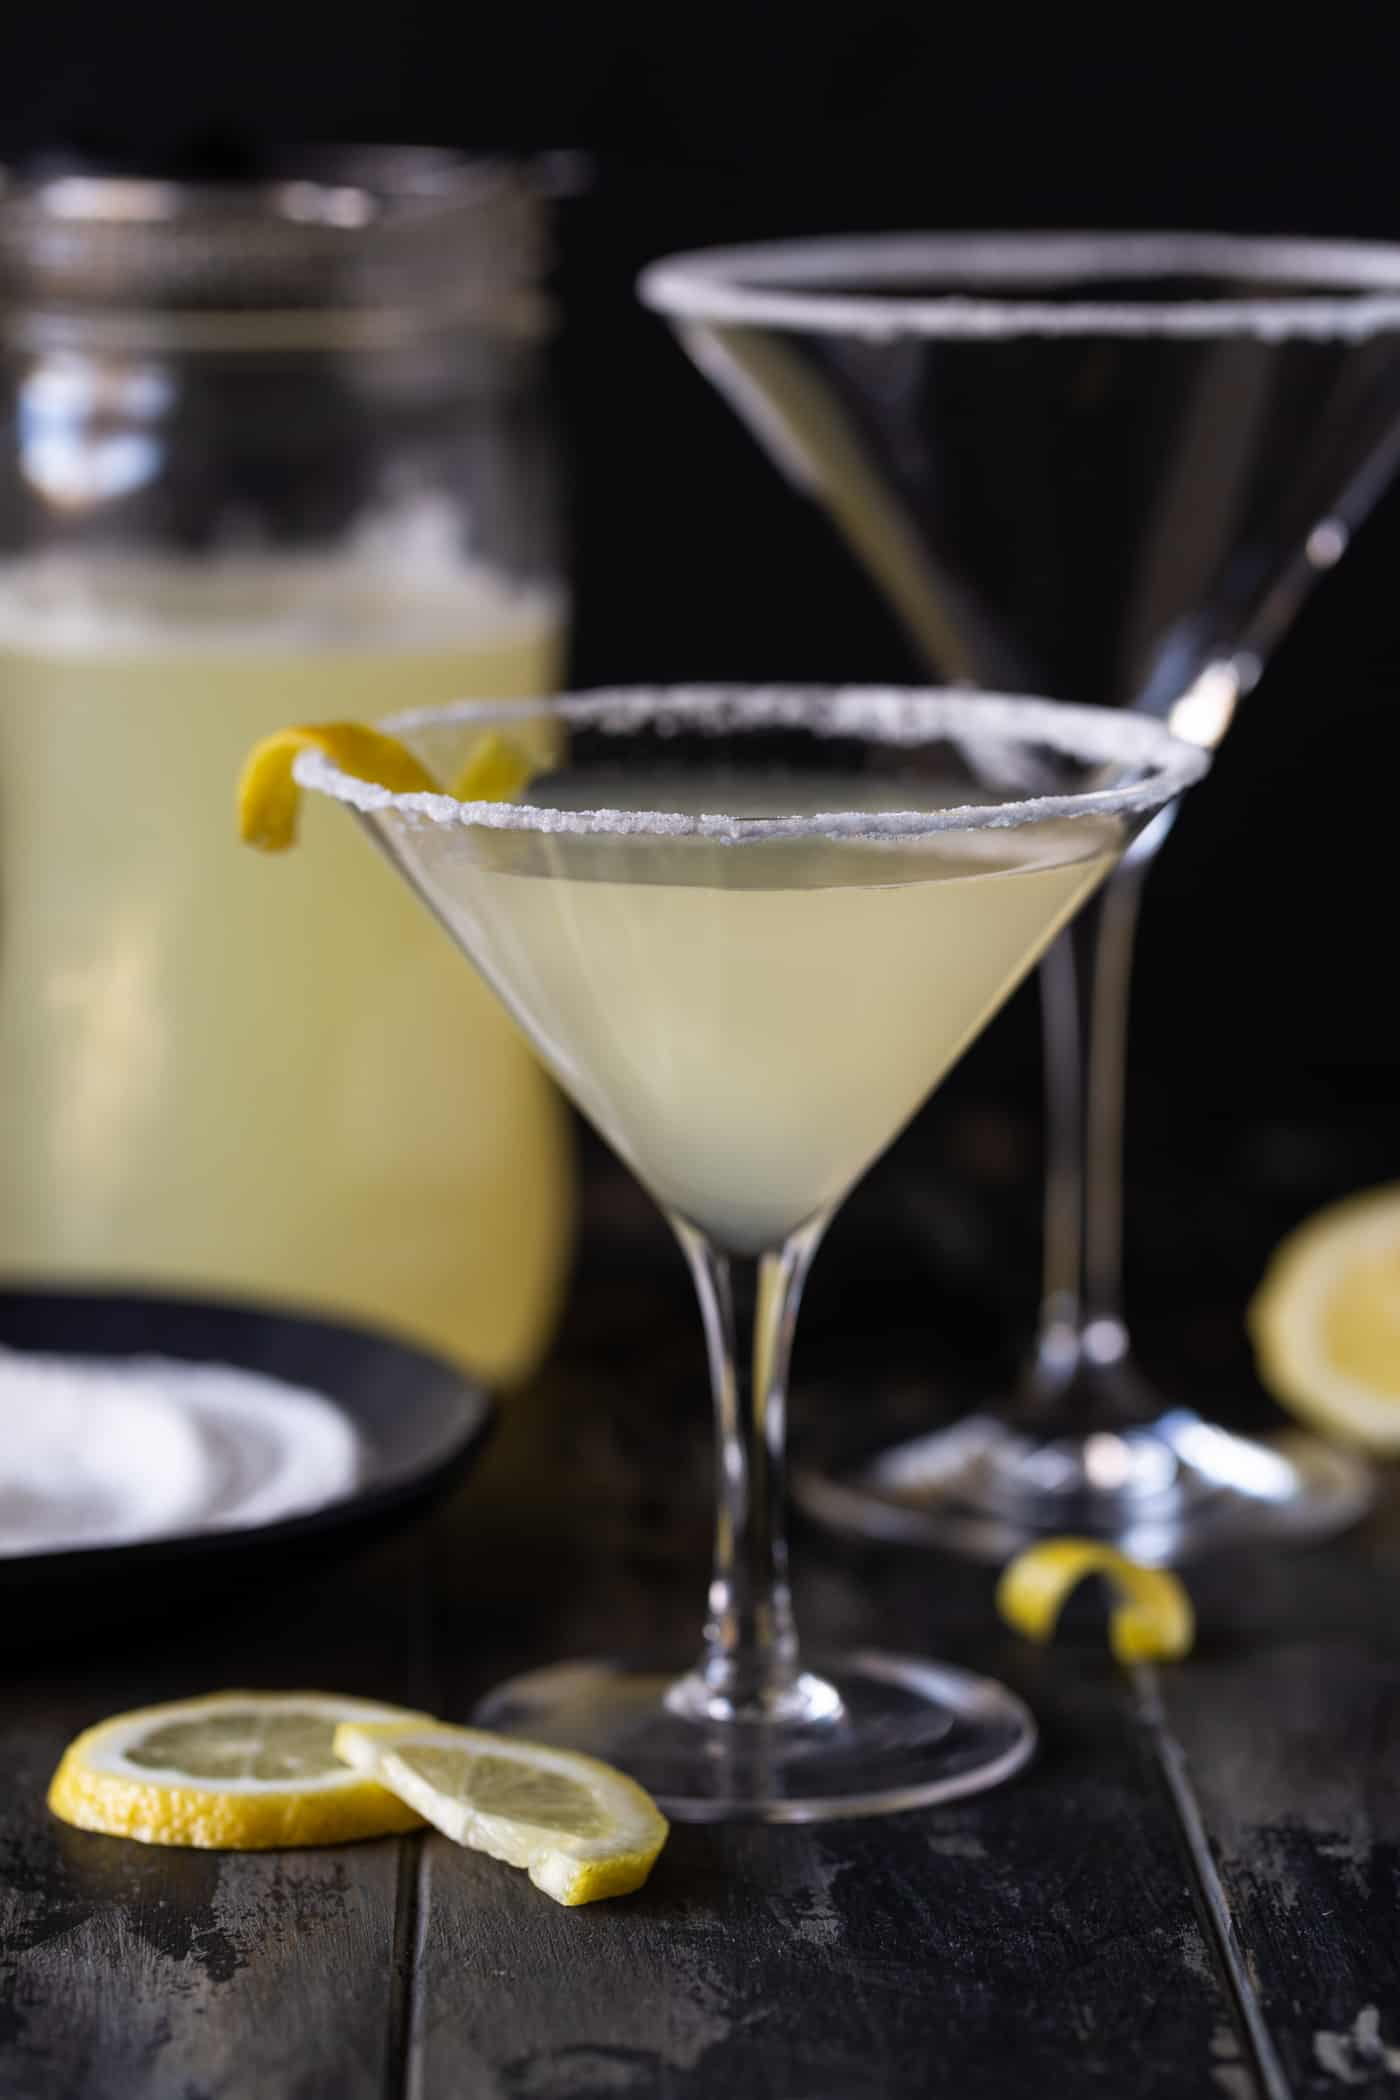 Single lemon drop martini is a short martini glass rimmed in sugar.